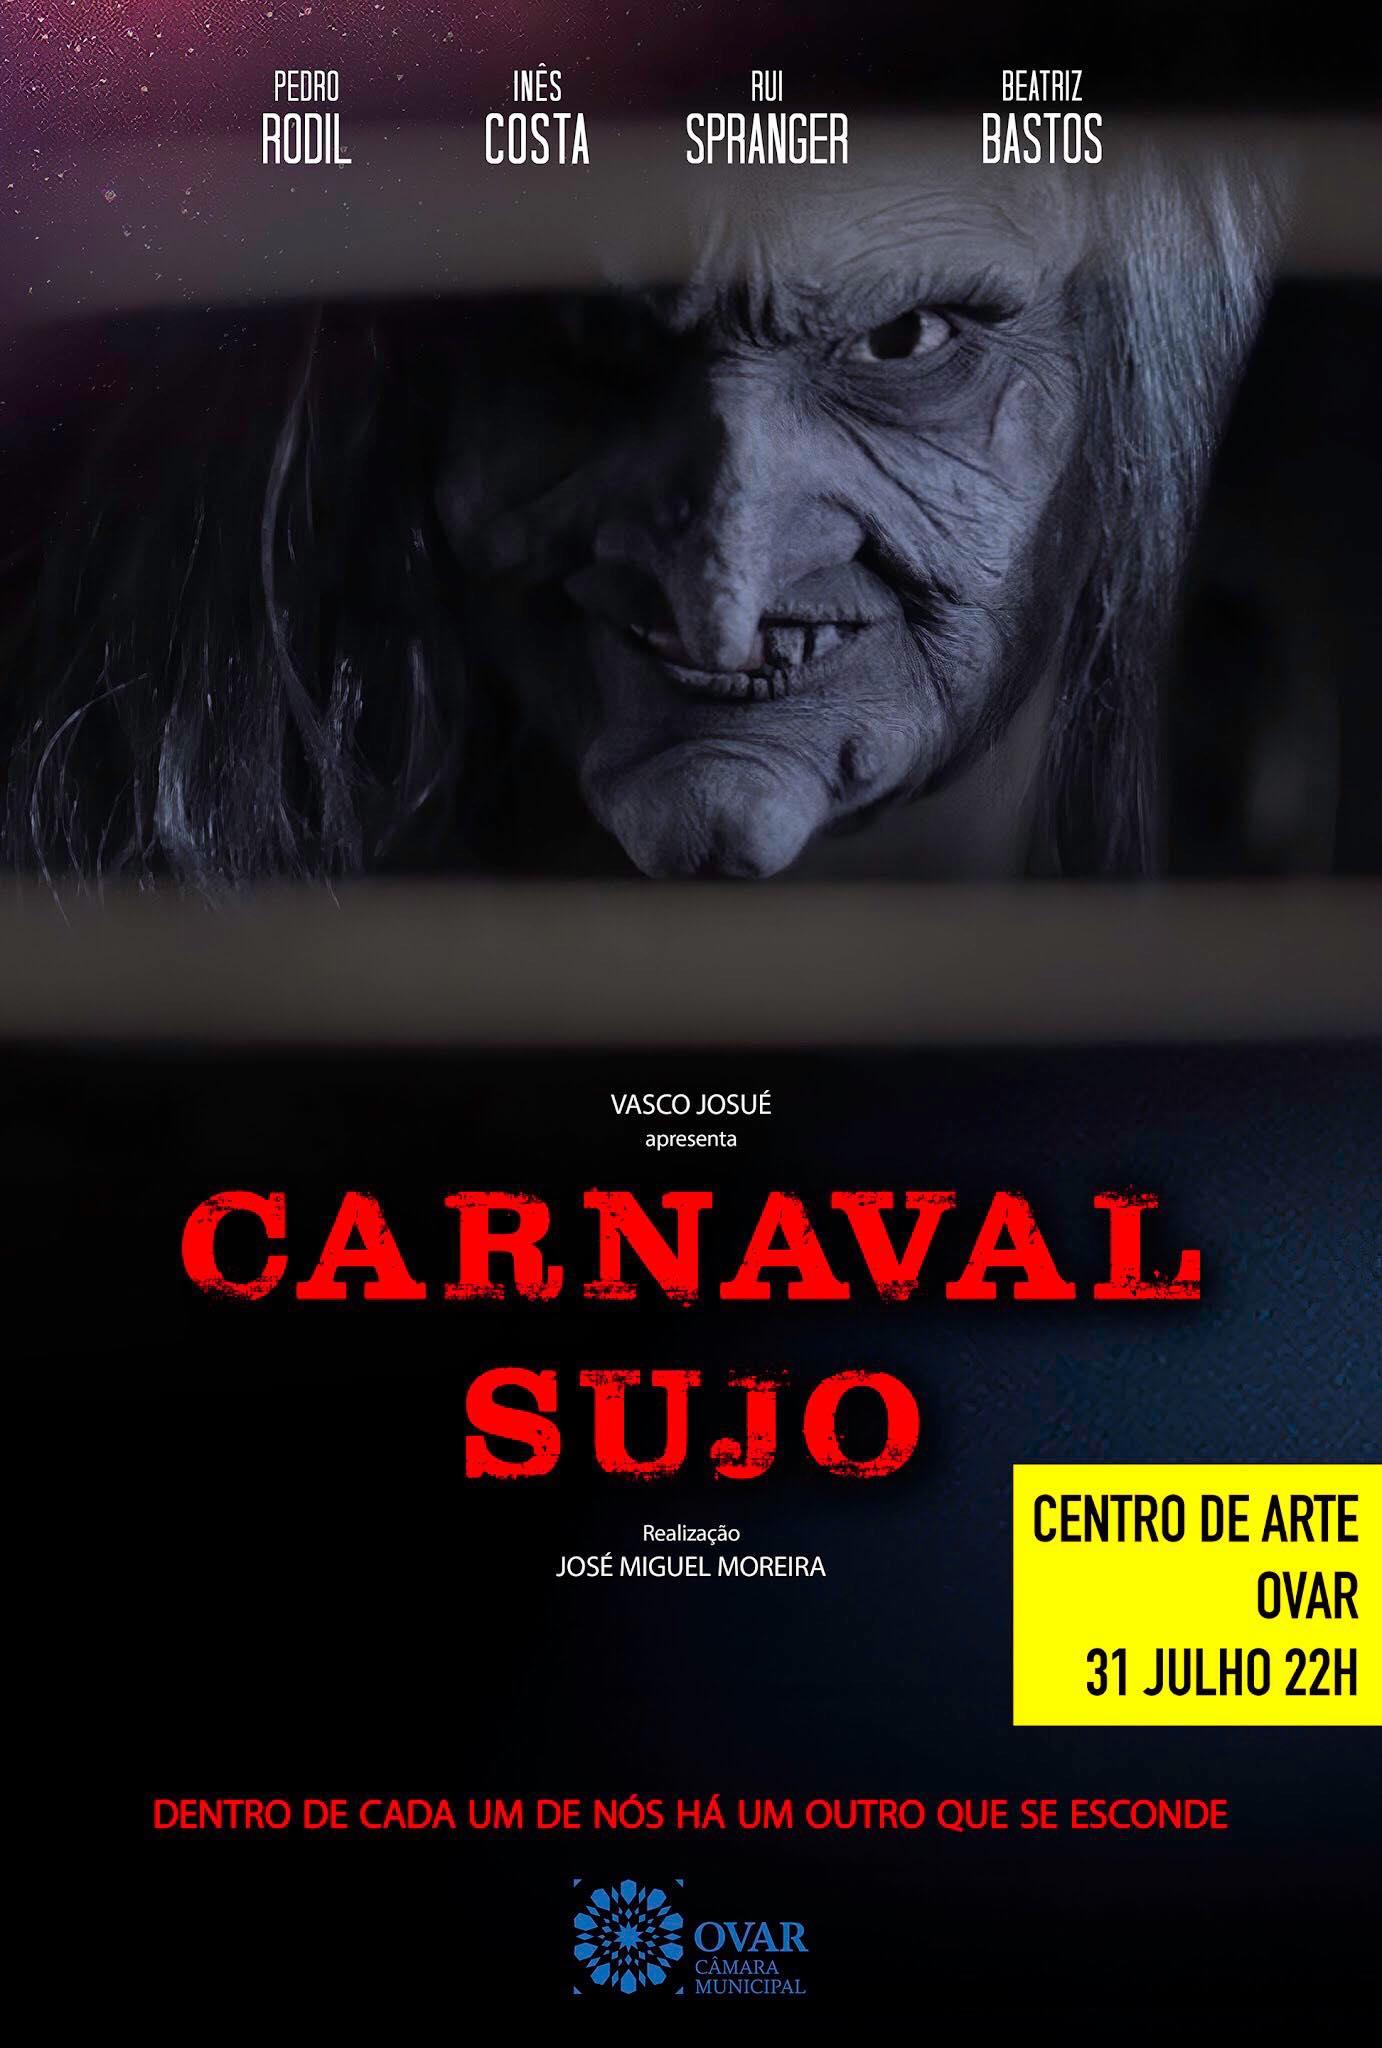 "<span  class=""uc_style_uc_tiles_grid_image_elementor_uc_items_attribute_title"" style=""color:#ffffff;"">Ana Paula Rocha - Cinema - Carnaval Sujo - Outubro 2018 - 001</span>"